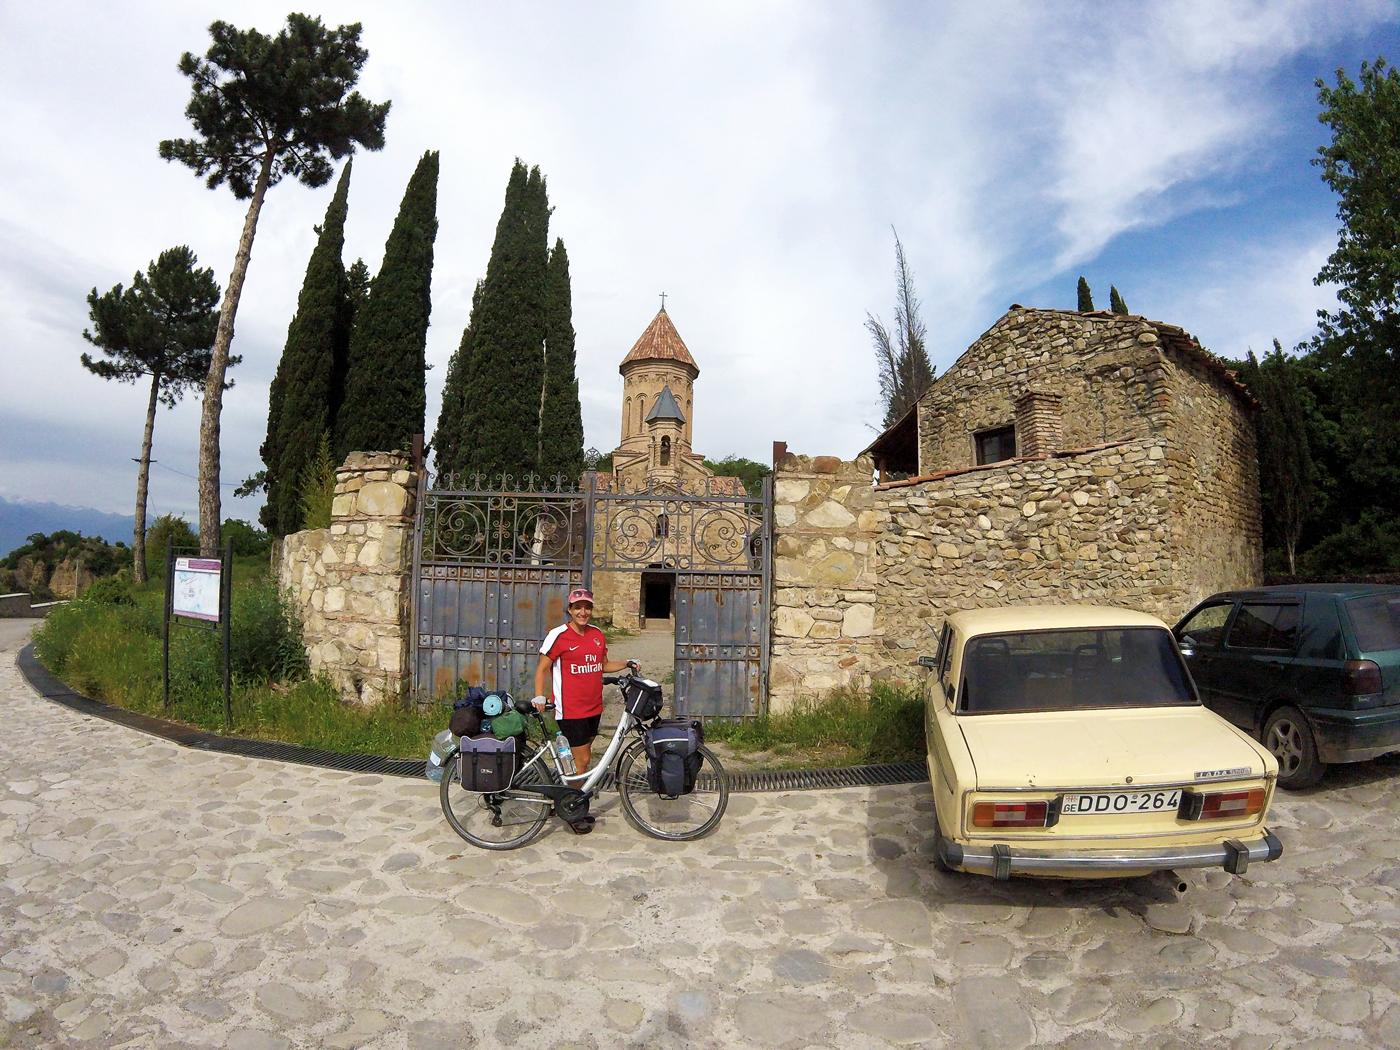 Voyage à vélo, la Géorgie à vélo, monastère d'Ikalto. Travel by bike, cycling Georgia, Ikalto Monastery.